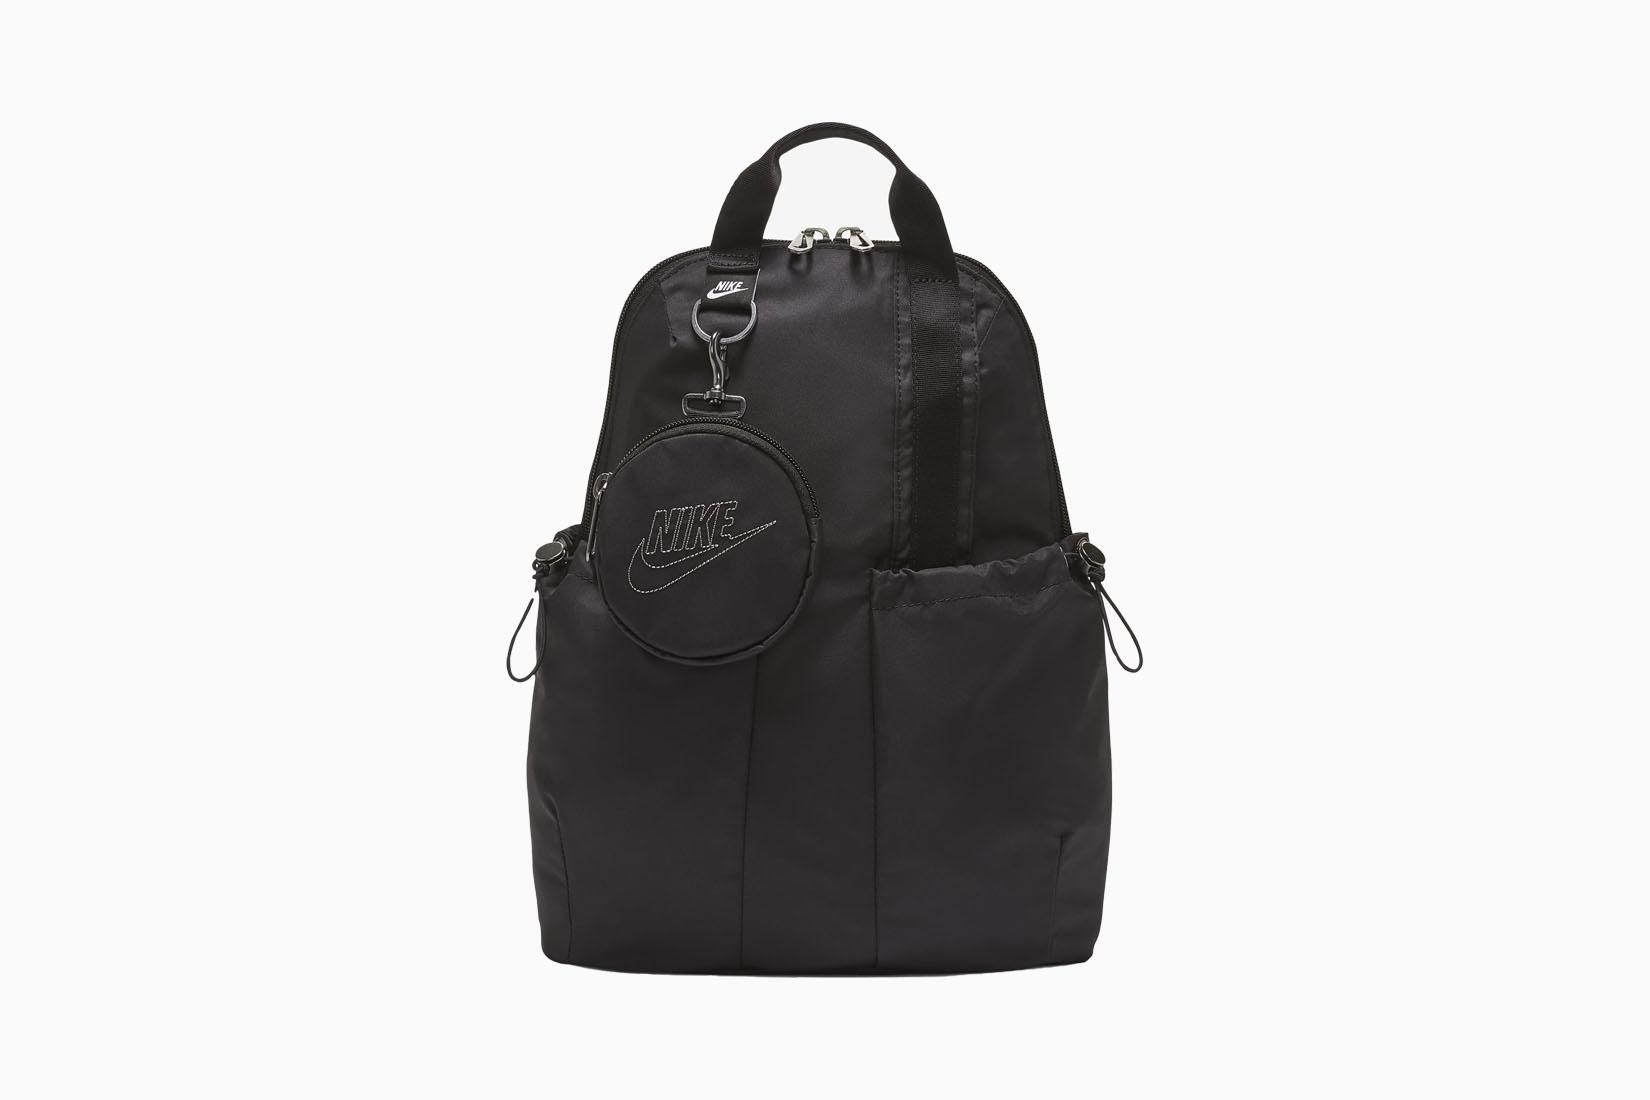 best backpacks women nike review Luxe Digital